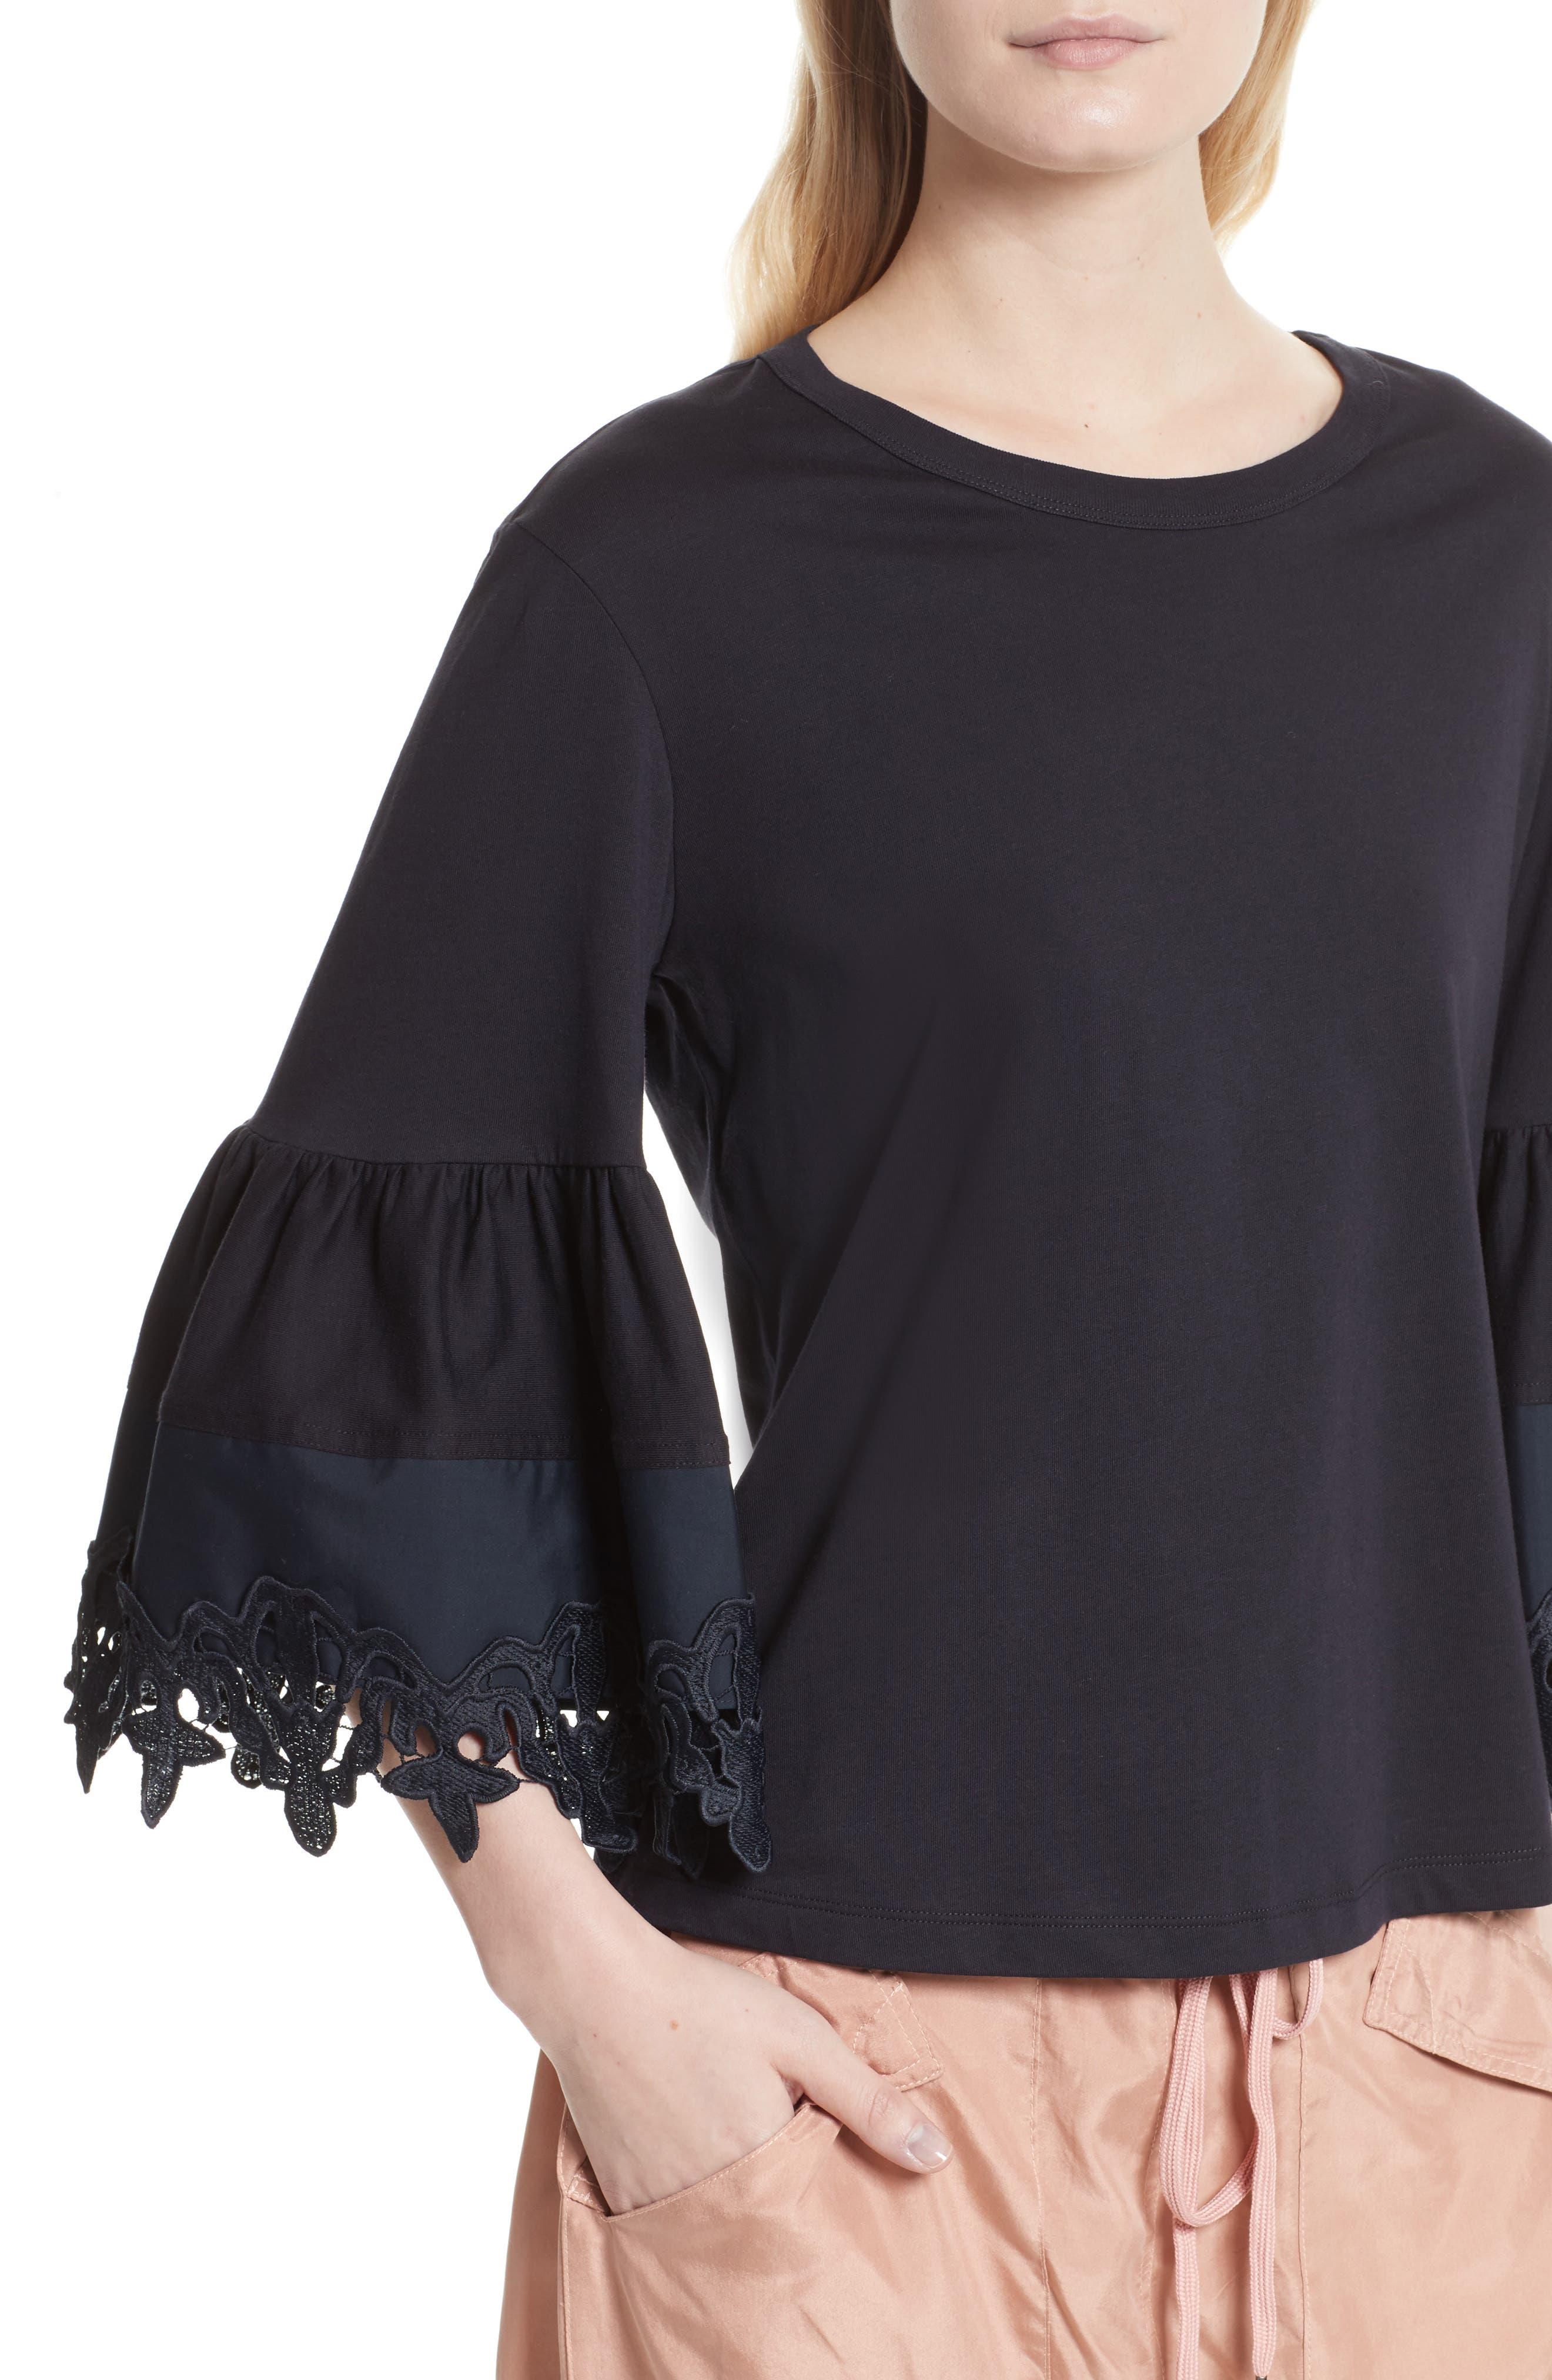 Lace Trim Bell Sleeve Top,                             Alternate thumbnail 4, color,                             Black